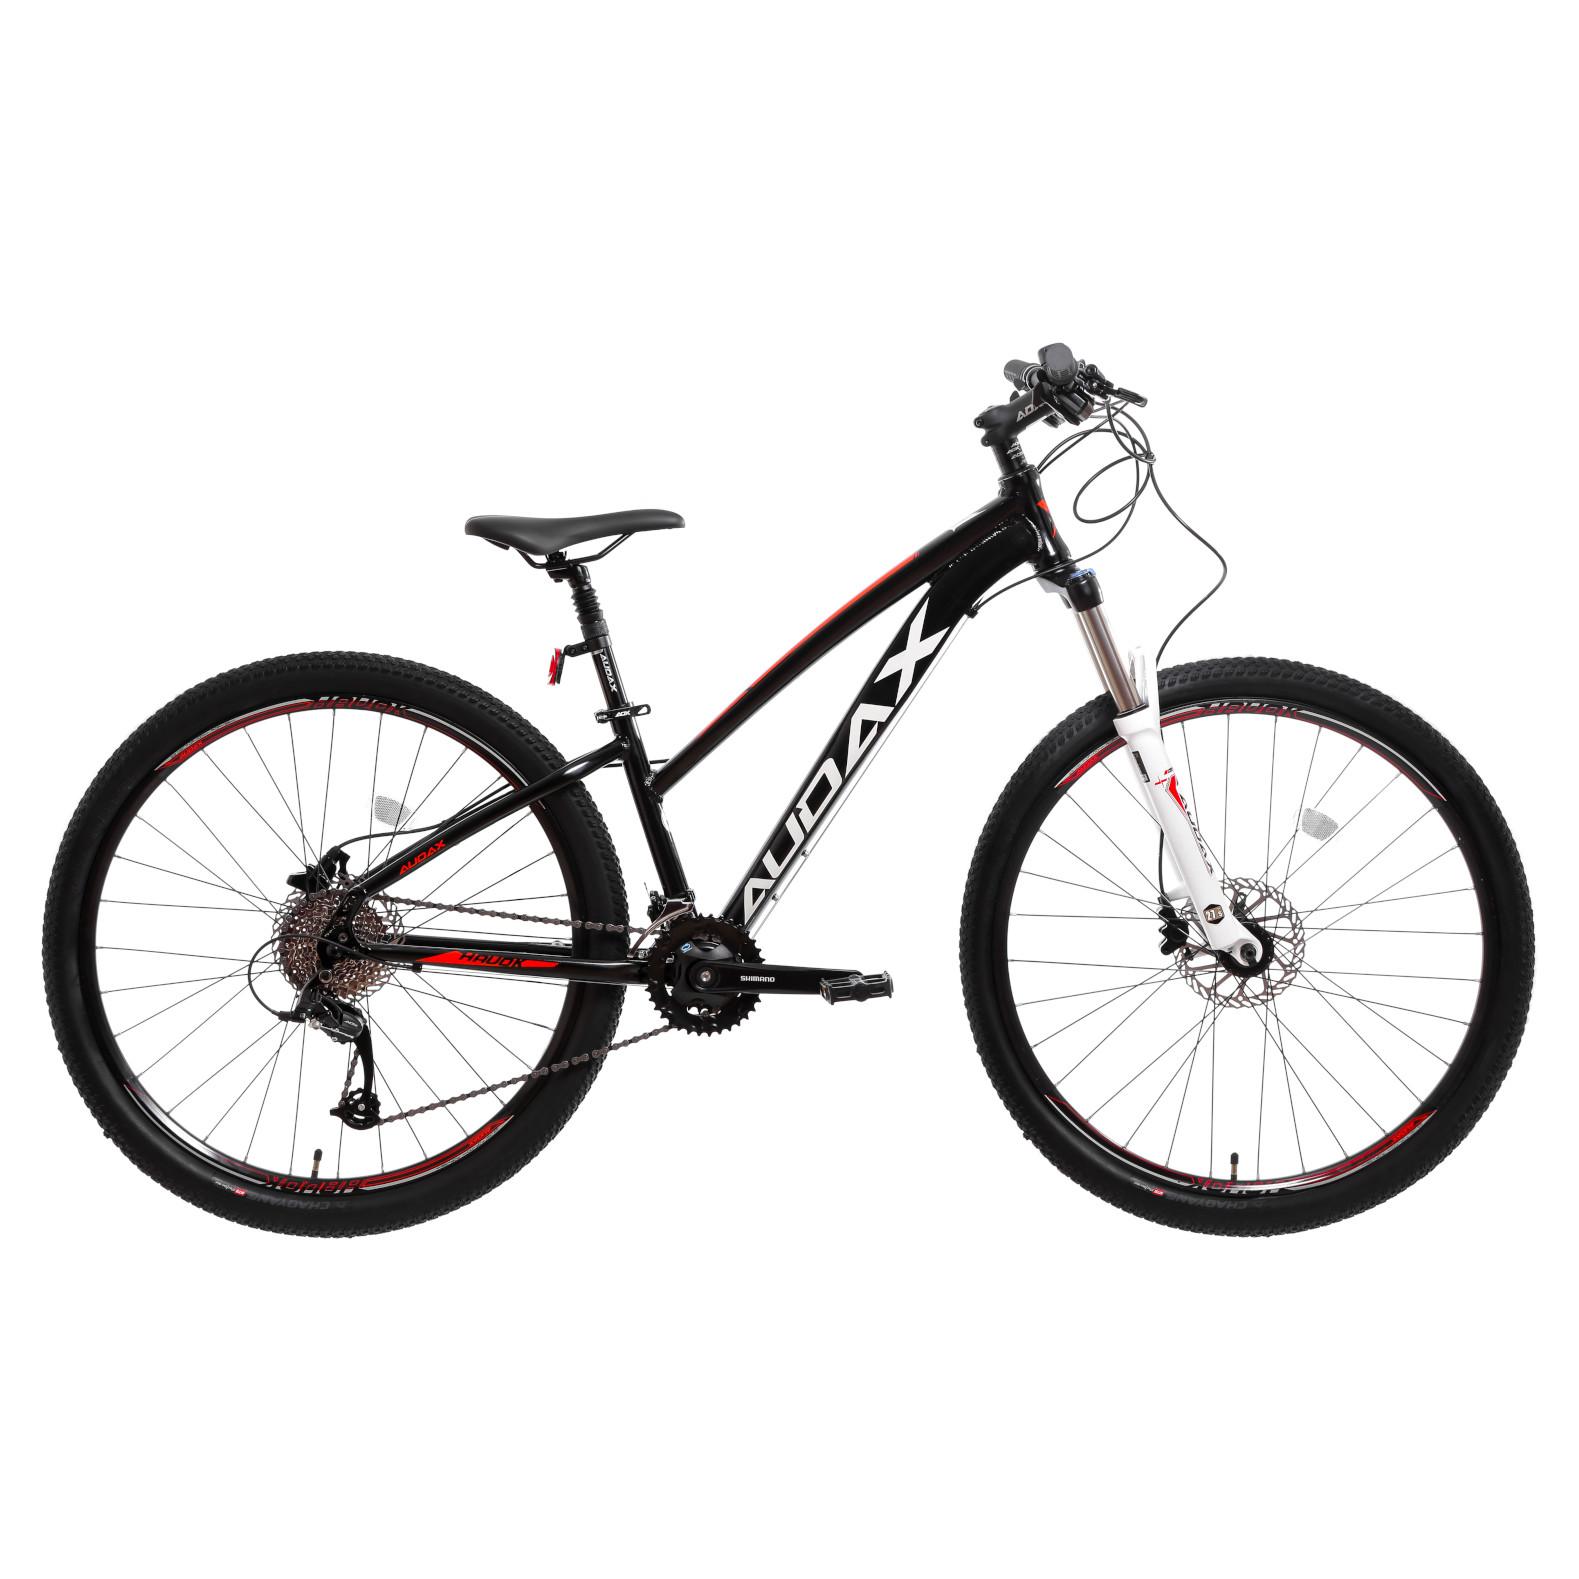 Bicicleta MTB Audax Havok FX 27.5 16v 2021